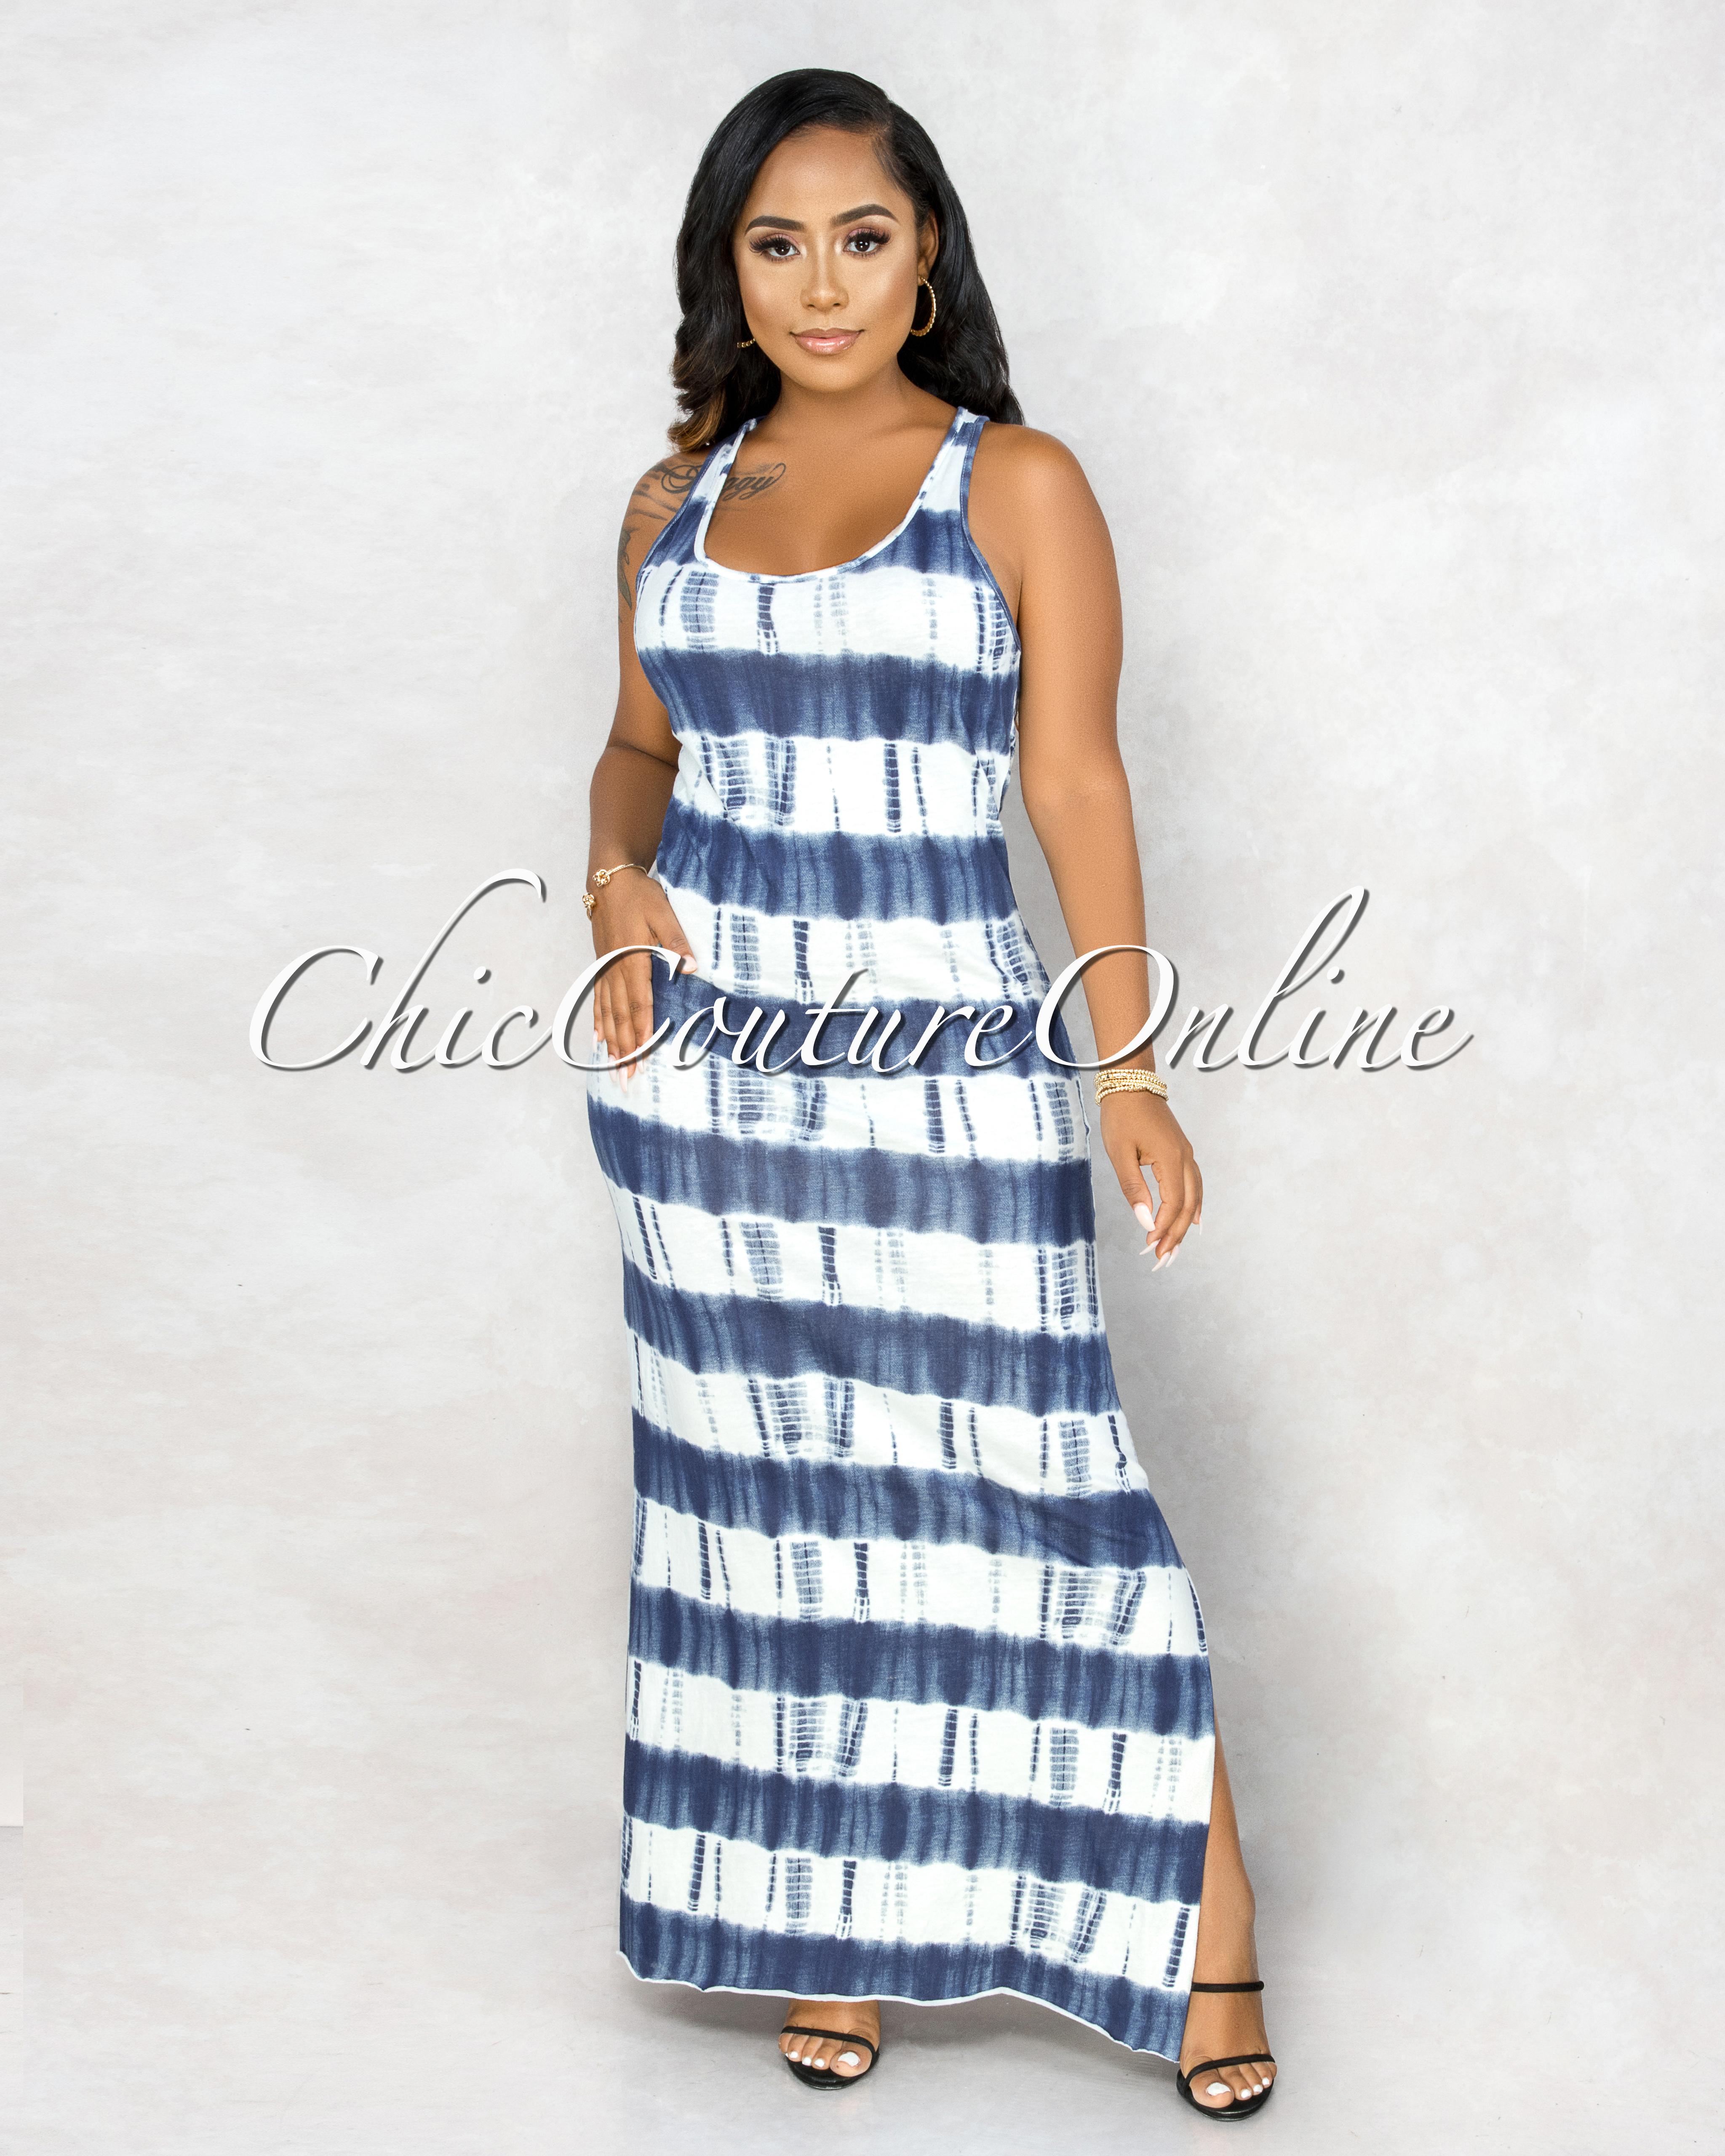 Levitt Dark Blue Tie-Dye Side Slits Maxi Dress